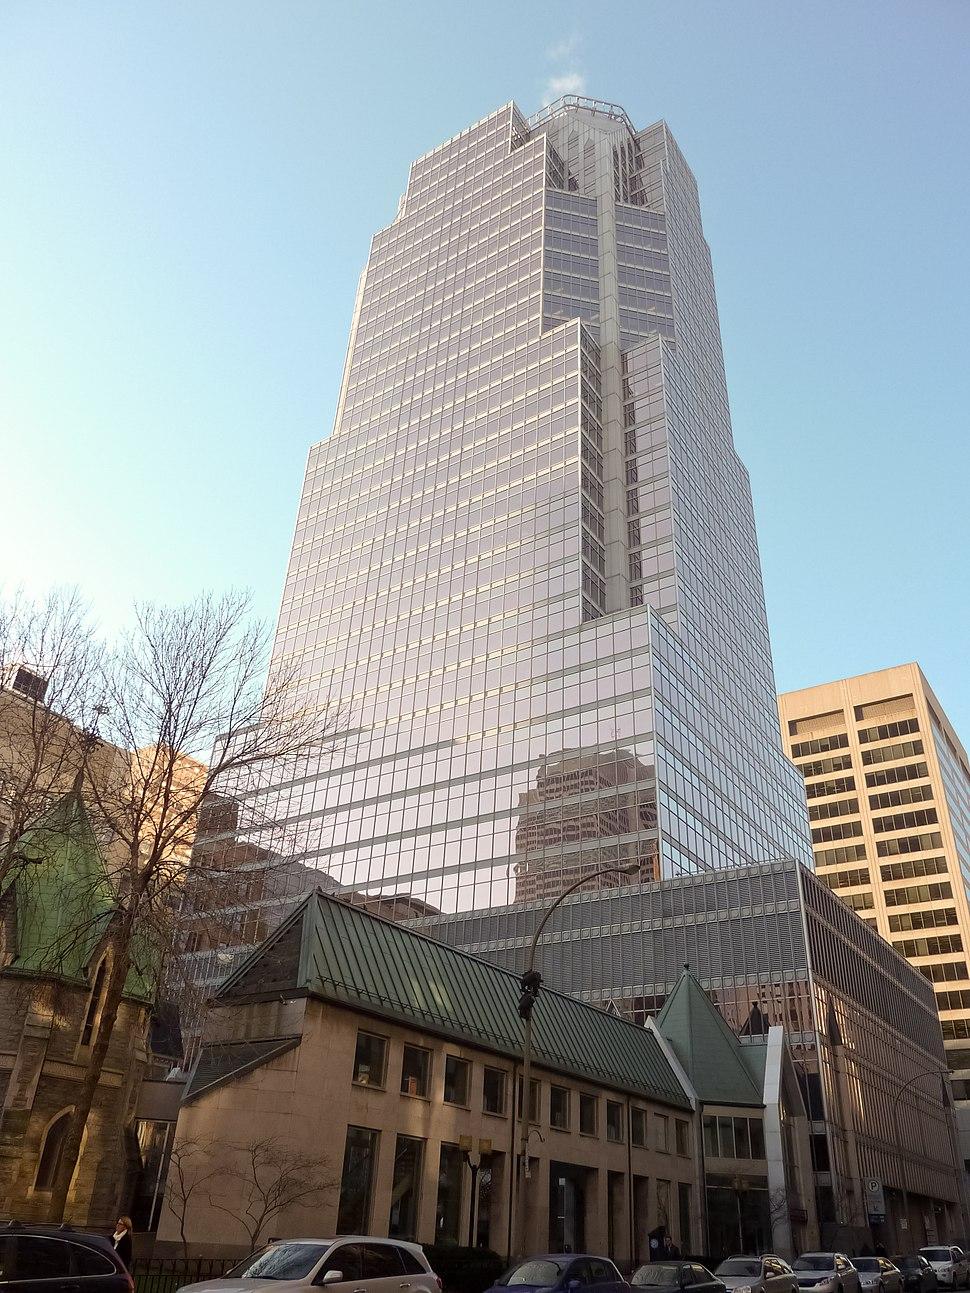 Montreal KPMG Tower